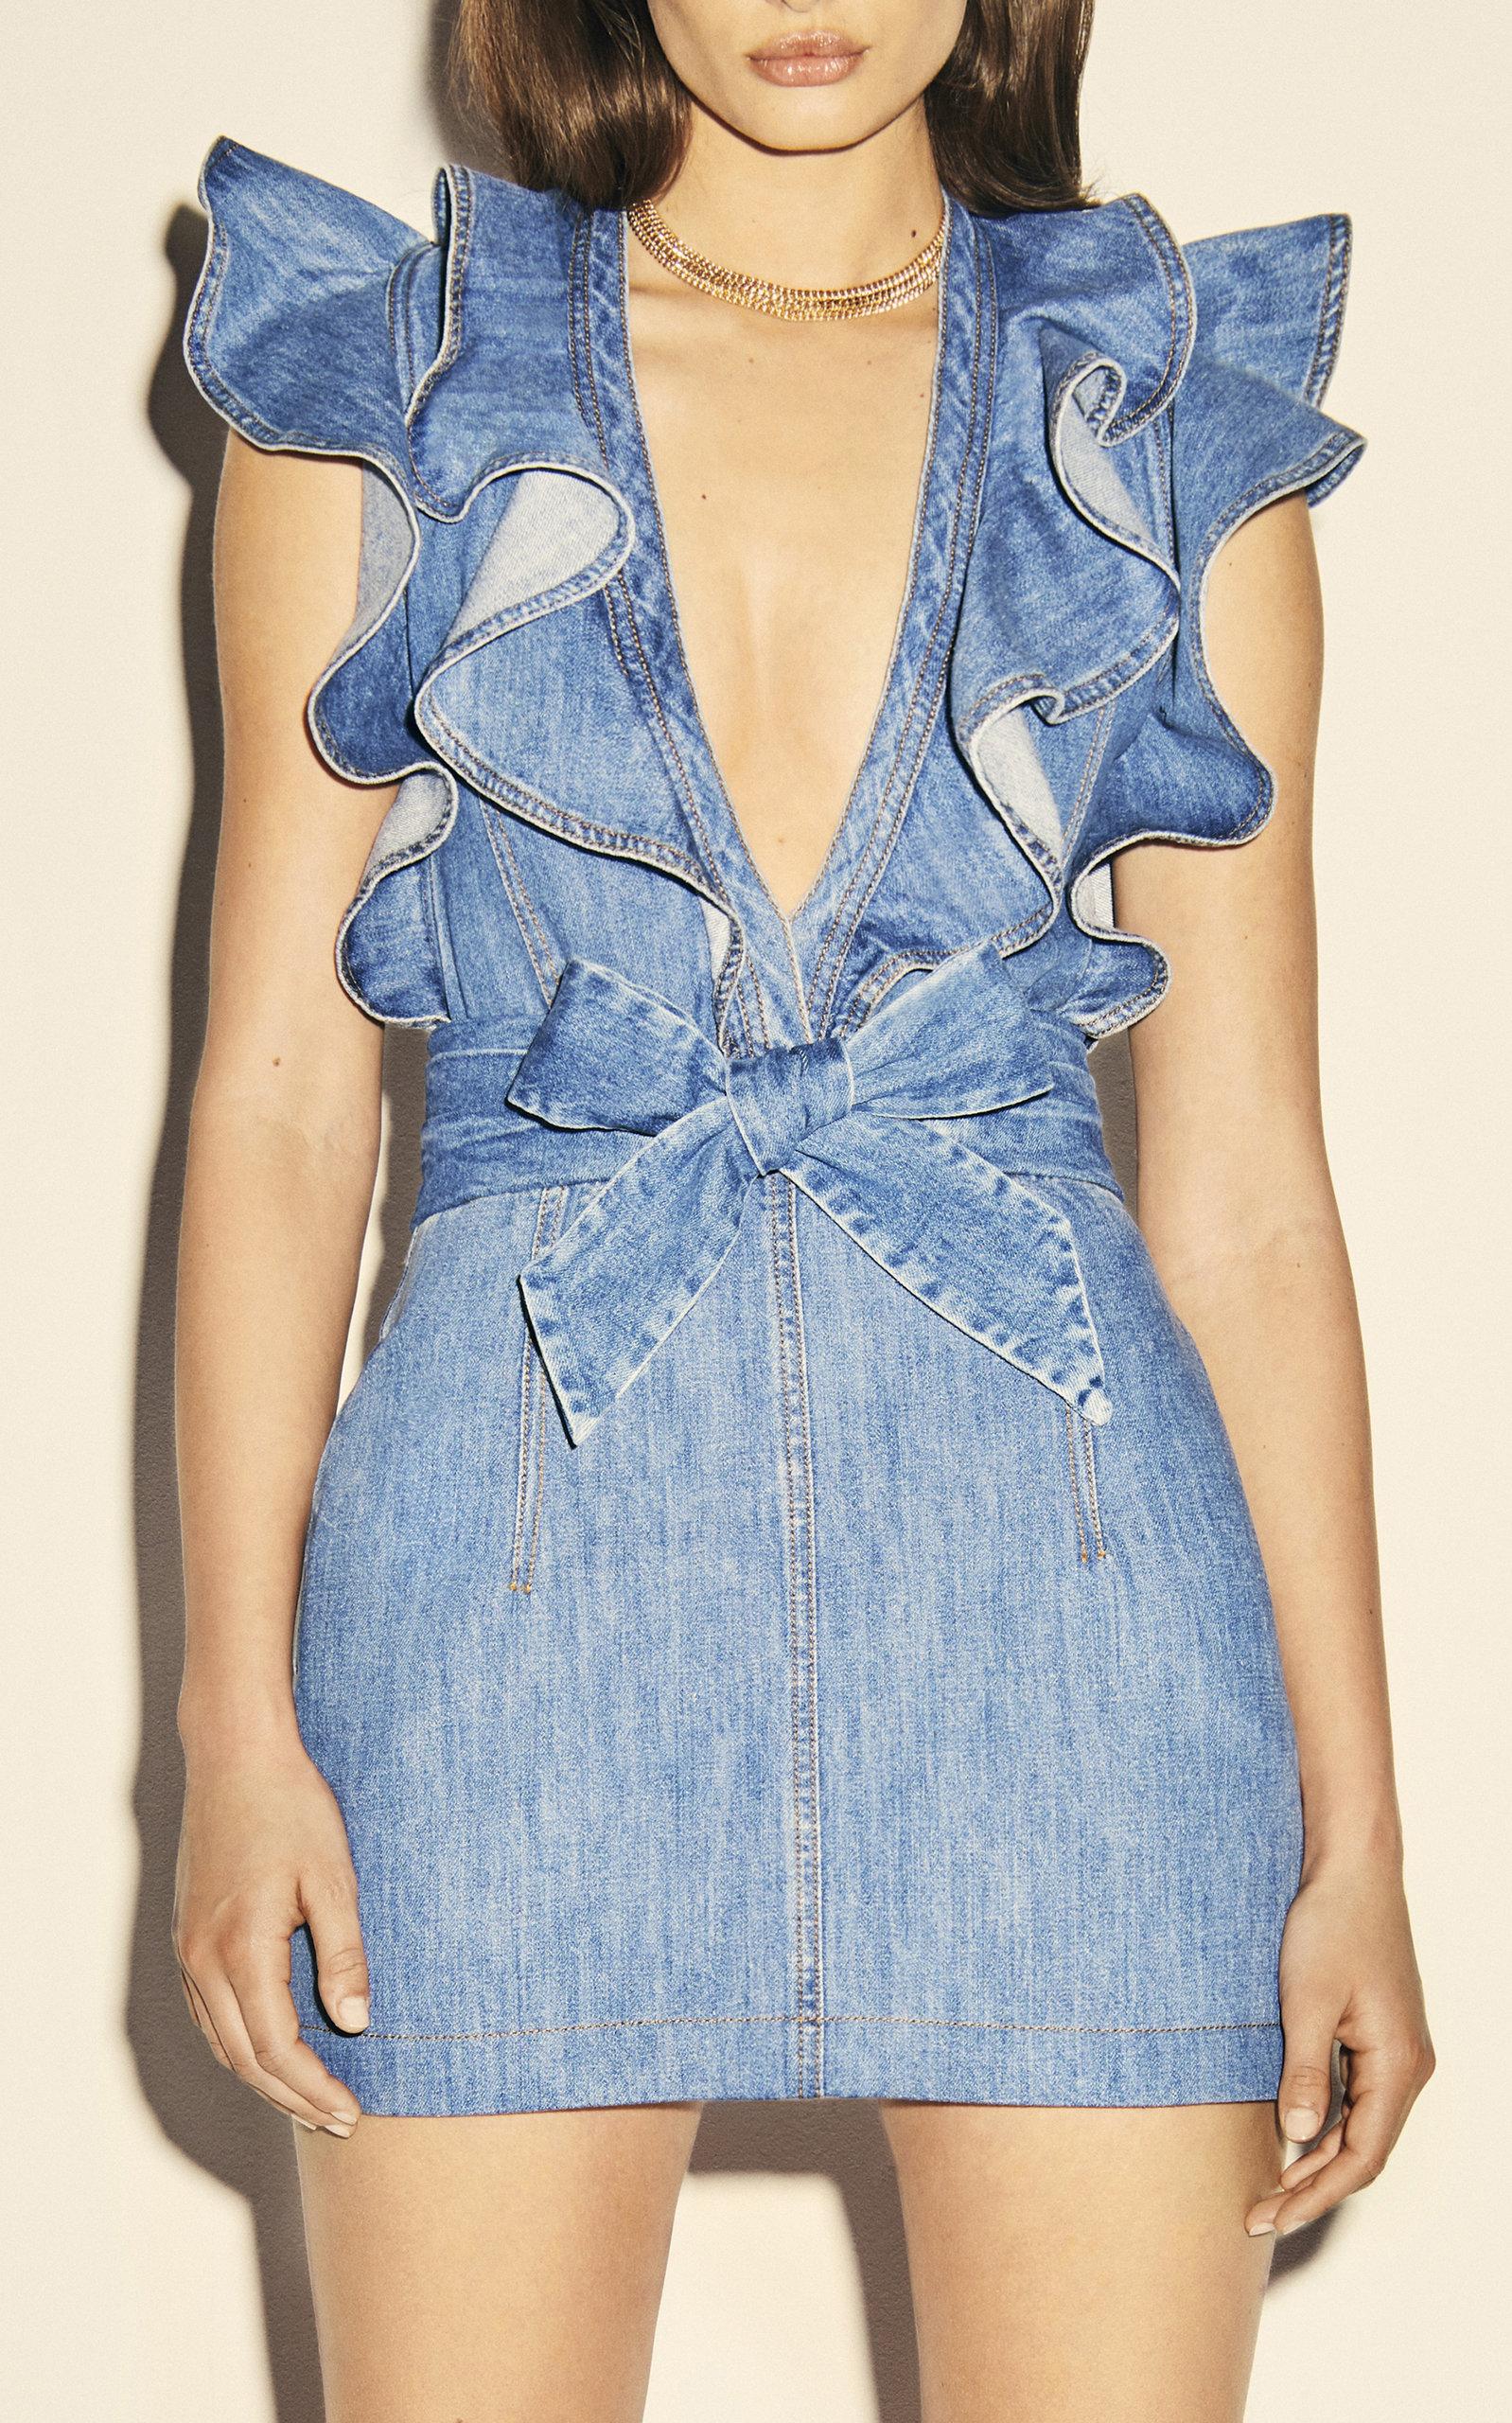 Philosophy Di Lorenzo Serafini Ruffle Accented Denim Mini Dress Denim Mini Dress Mini Dress Fashion [ 2560 x 1598 Pixel ]